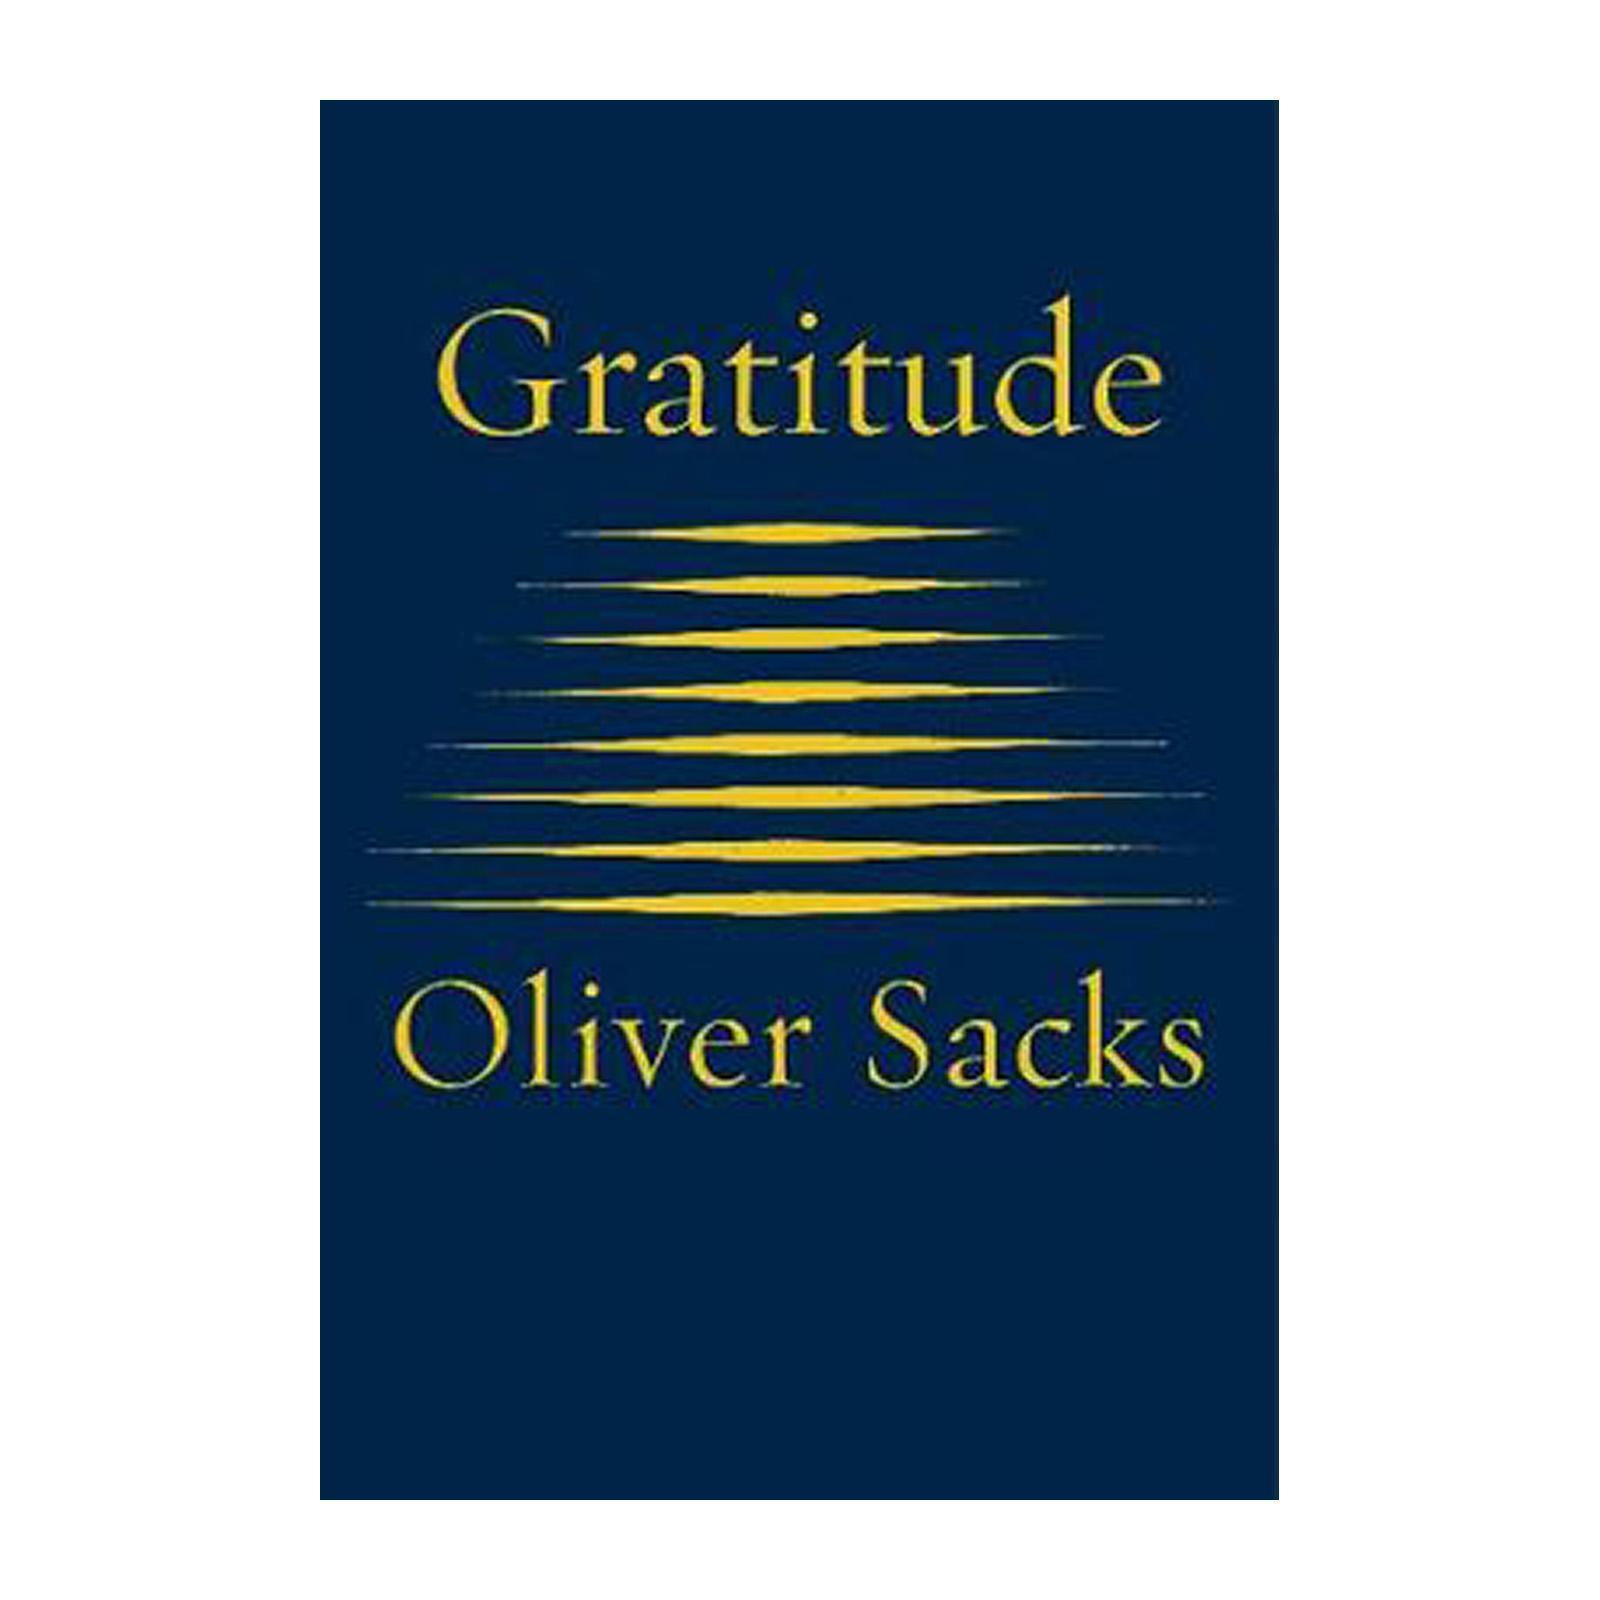 Gratitude (Hardcover)